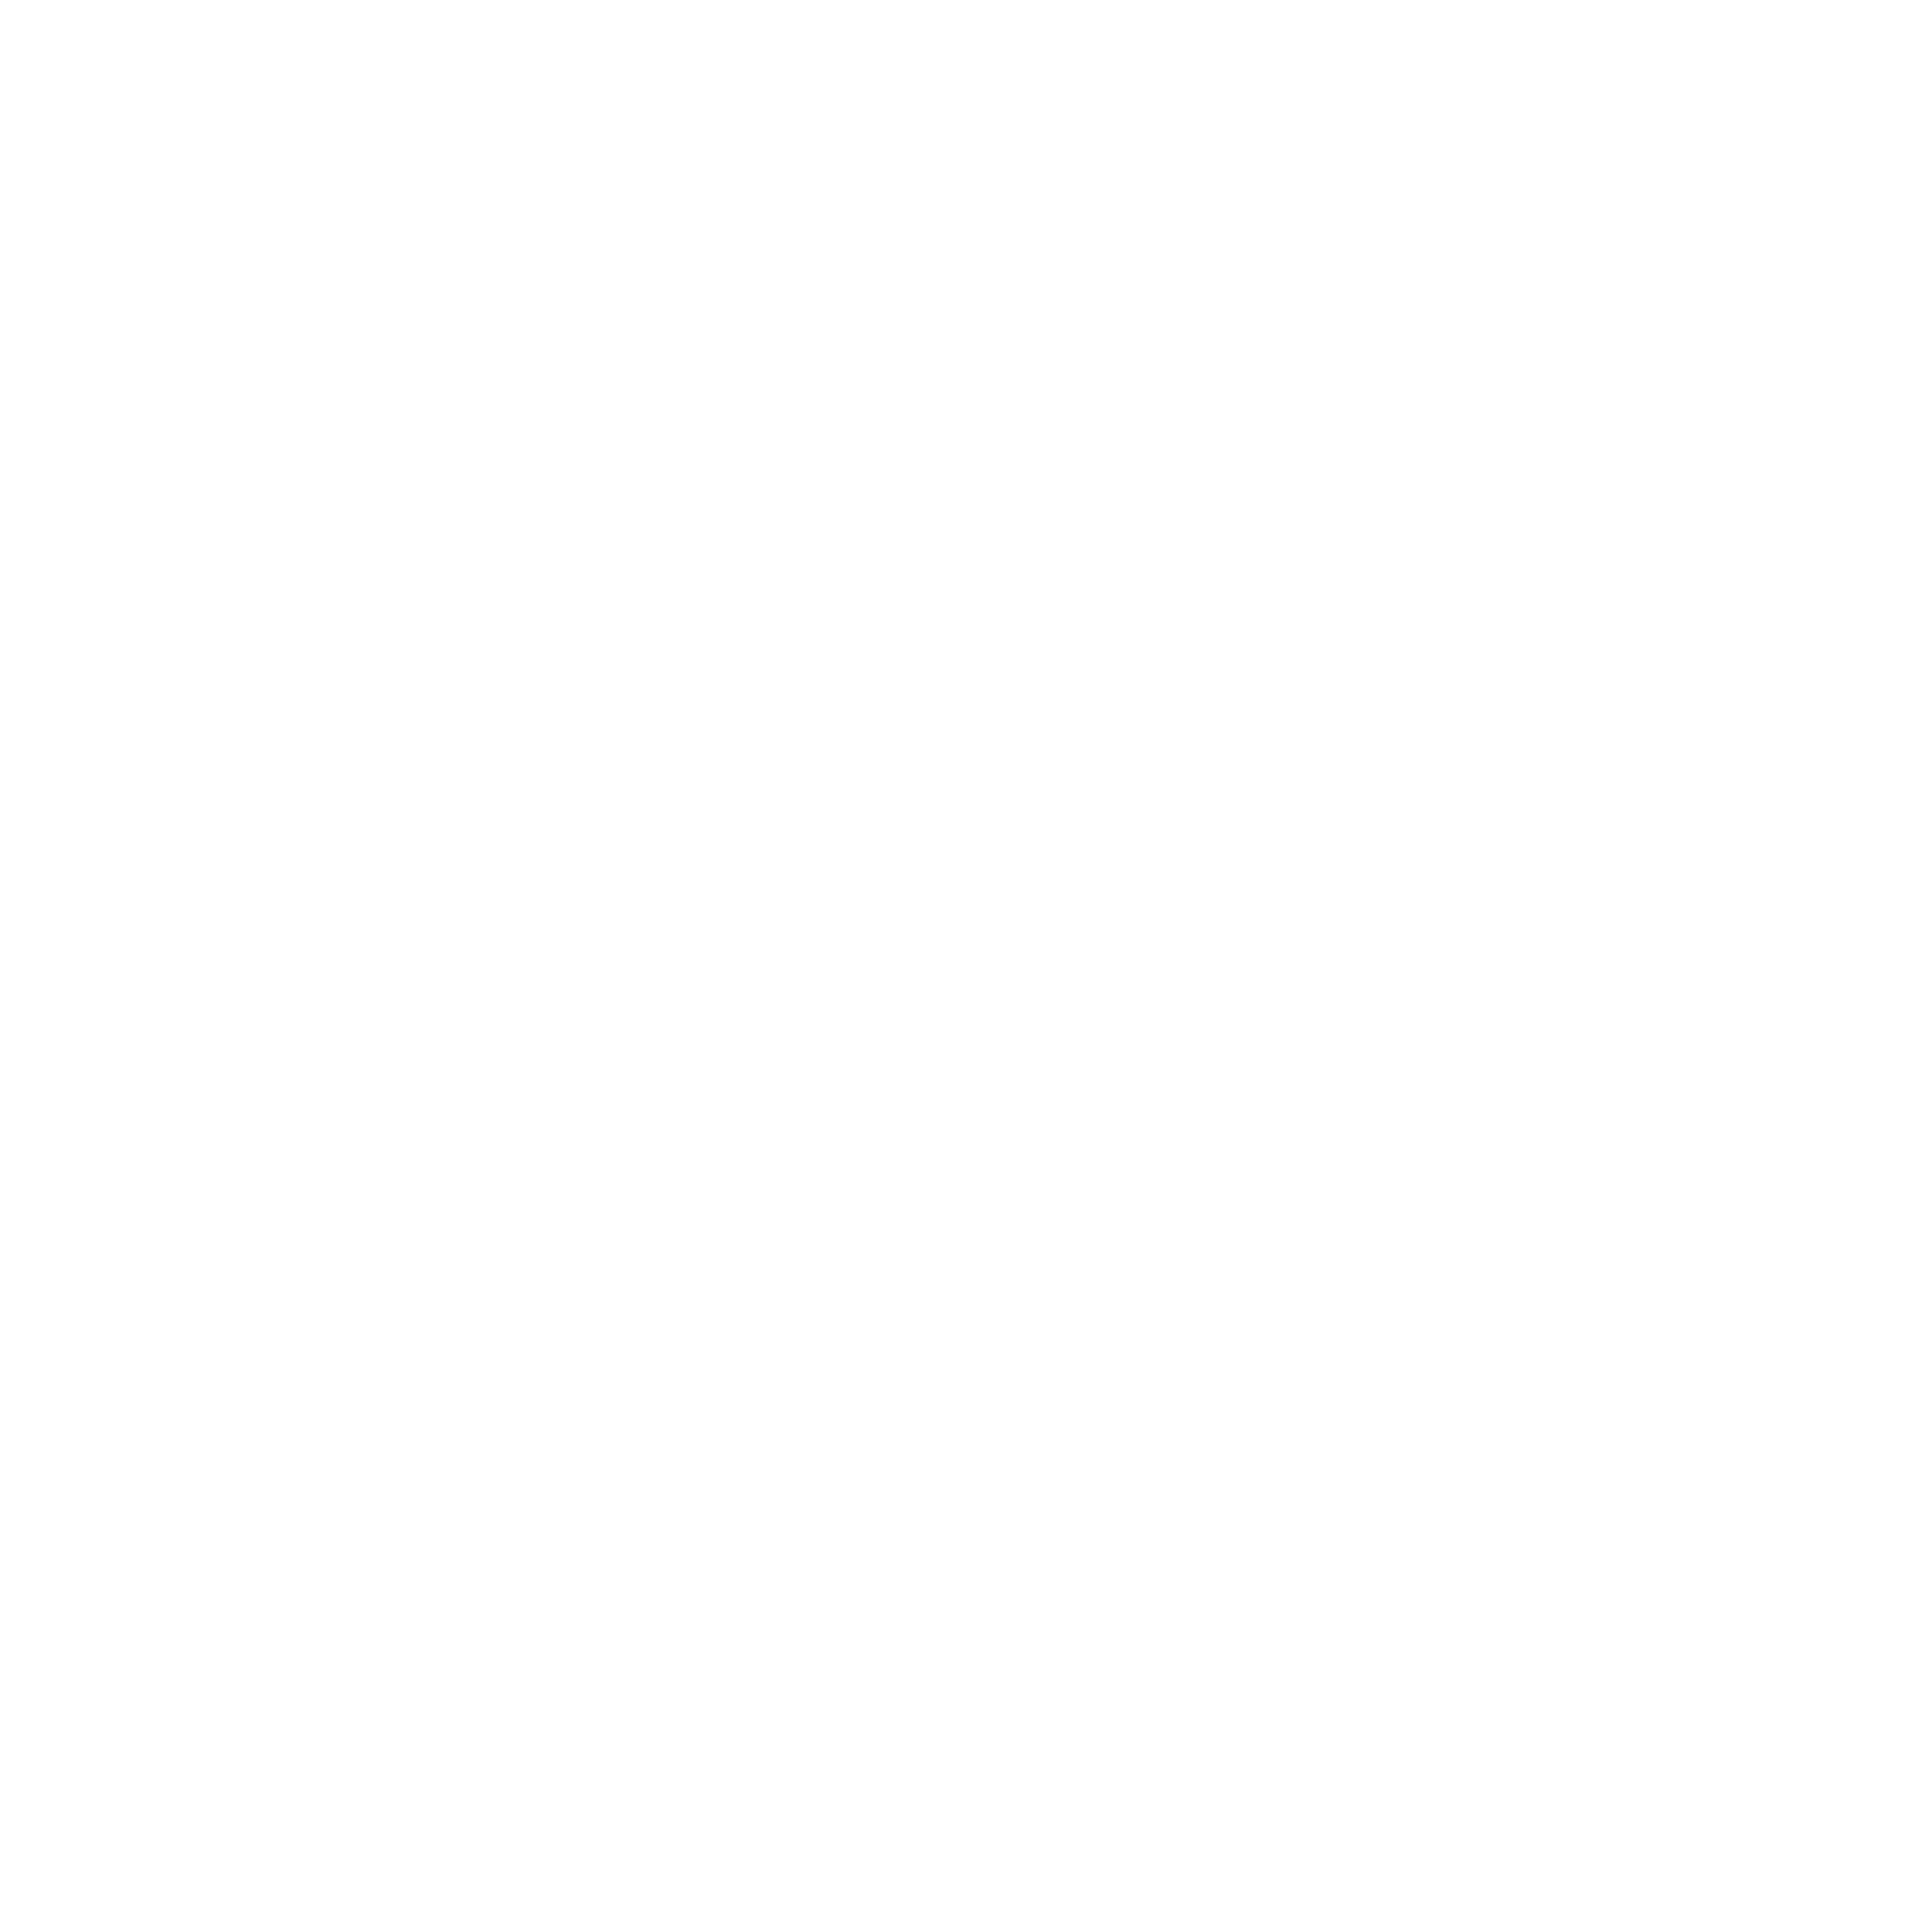 Dr. Dawn DeLavallade